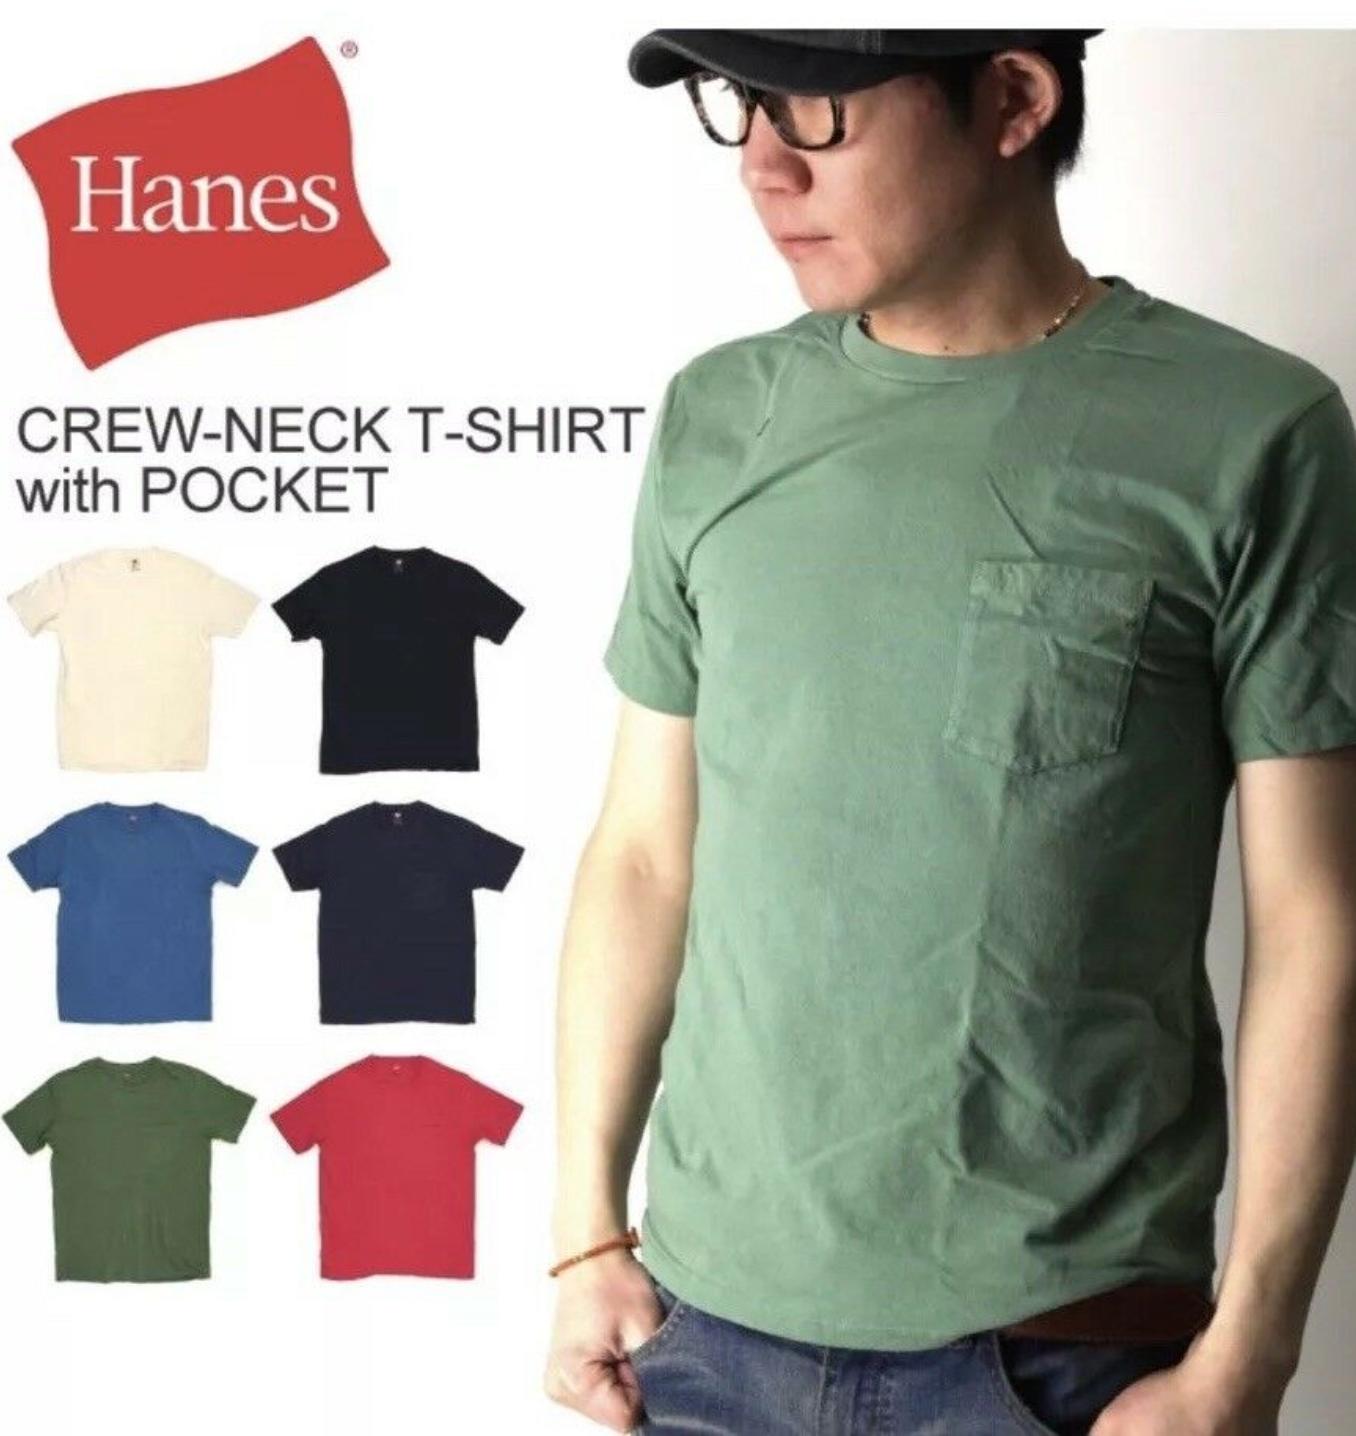 Hanes Men's Pocket T-Shirt Tagless ComfortSoft Crewneck 4-Pack